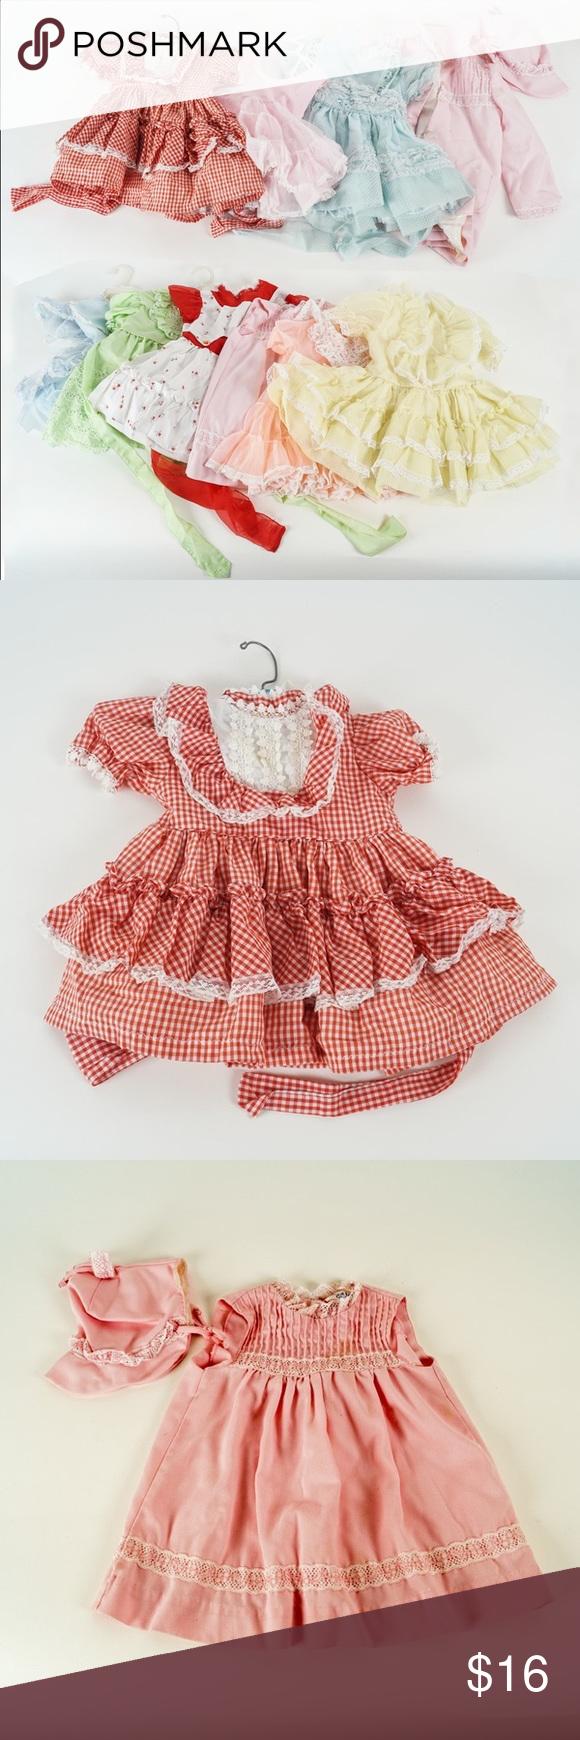 Martha S Miniatures 3t And 4t Vintage Dresses Vintage Dresses Little Girl Dresses Clothes Design [ 1740 x 580 Pixel ]